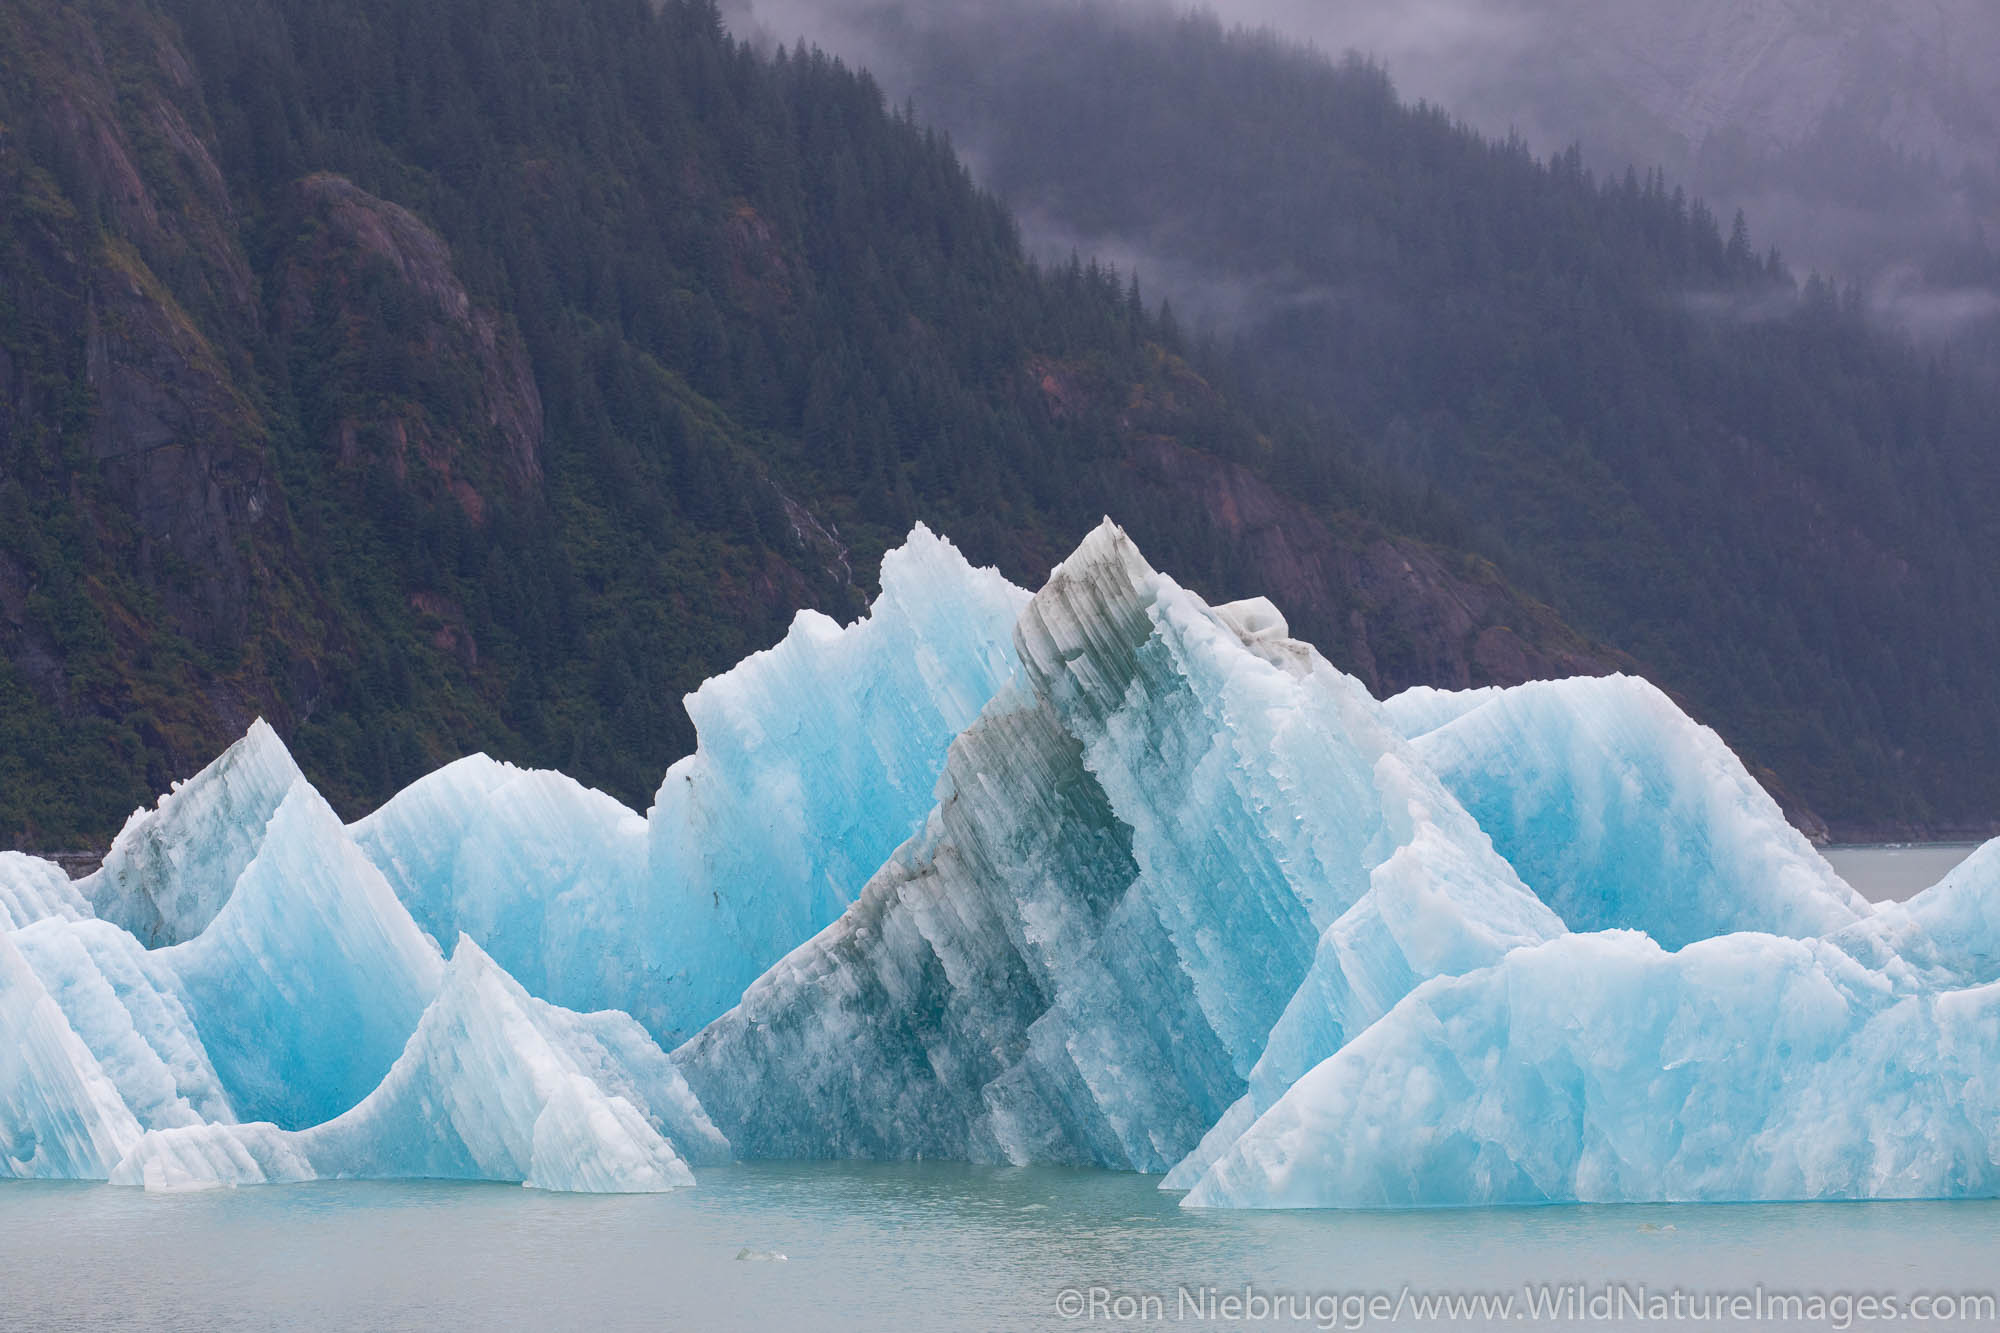 Iceberg. Endicott Arm, Alaska.